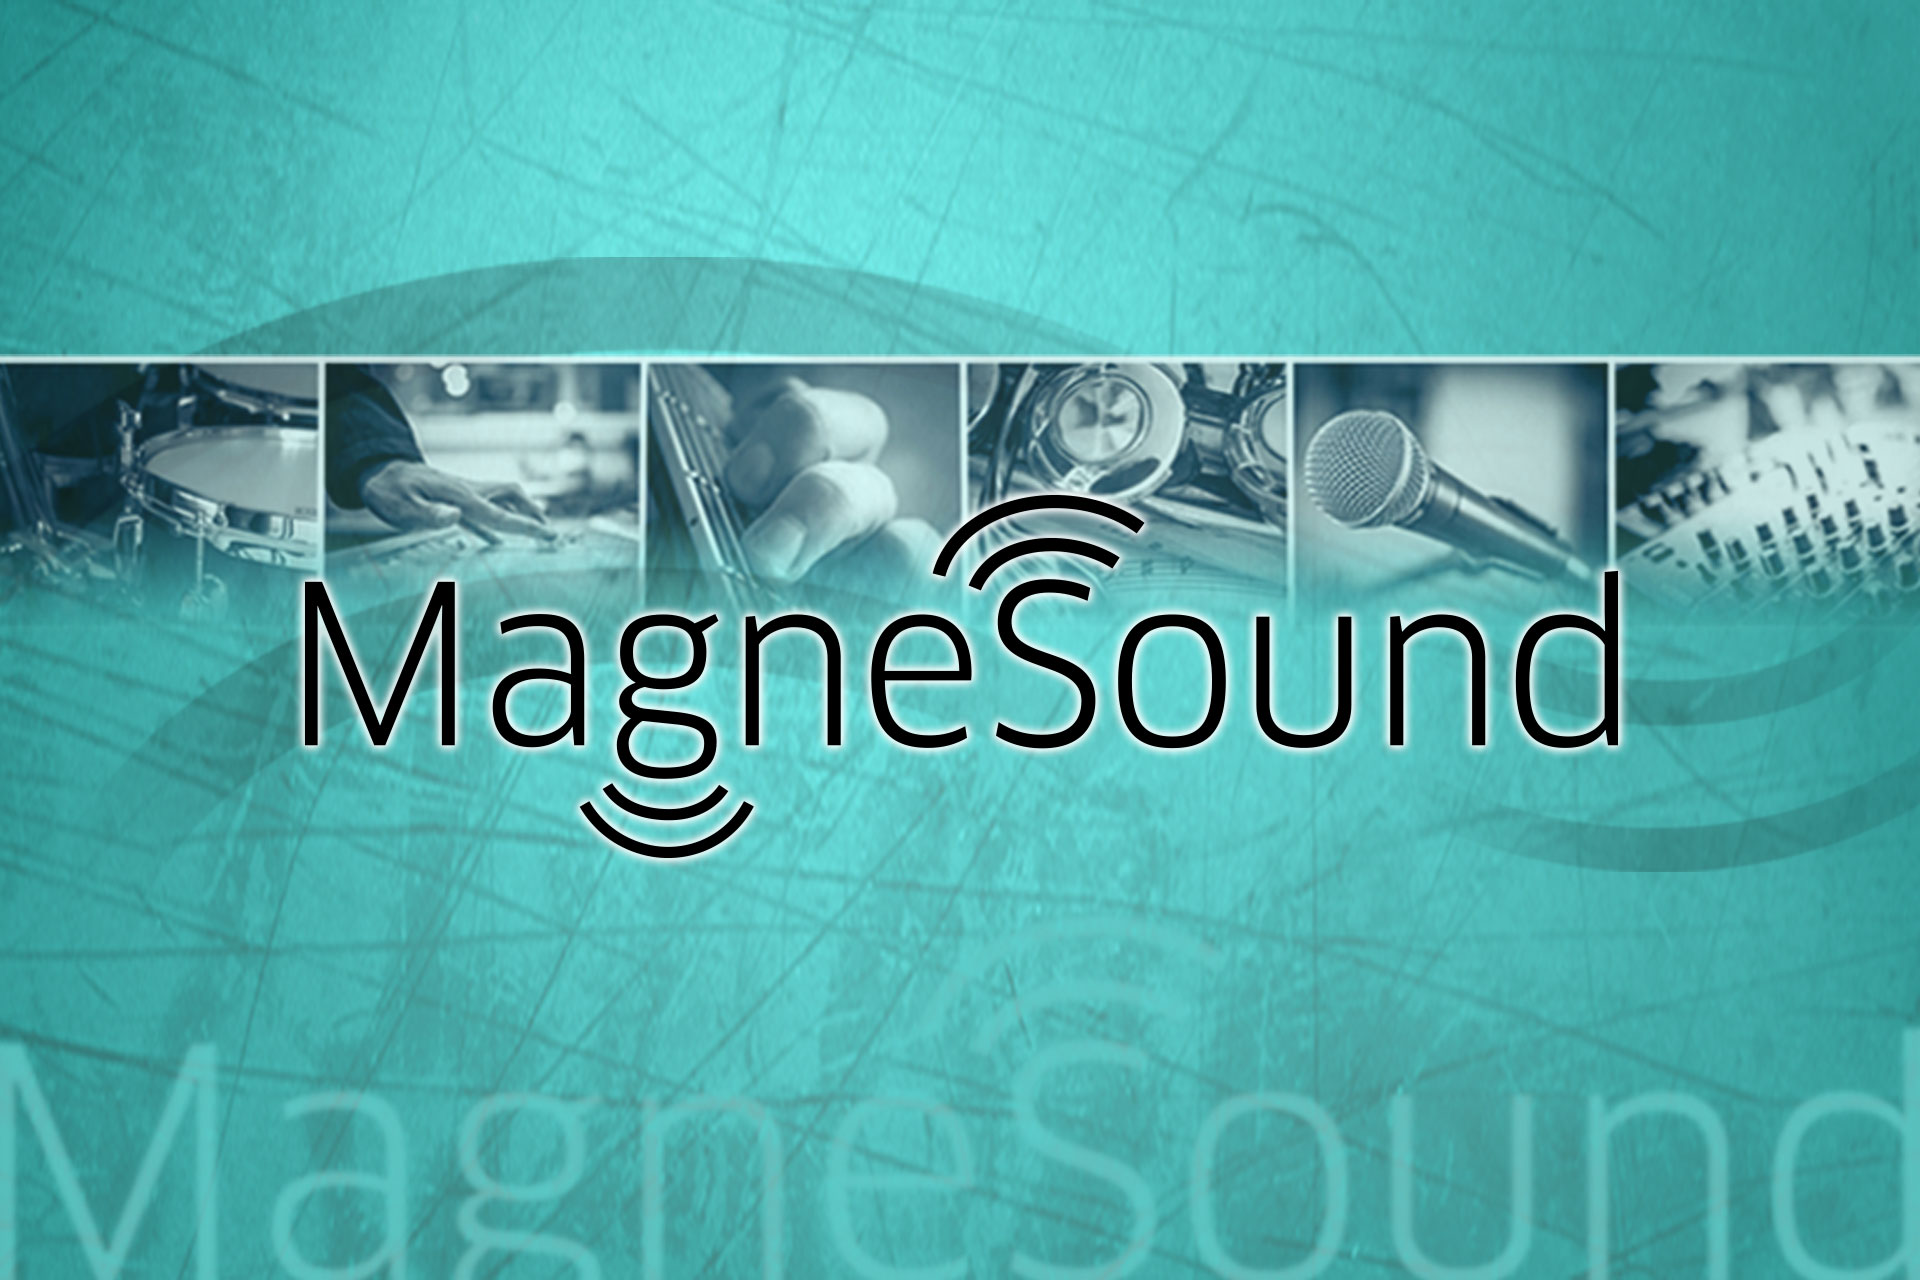 Magnesound